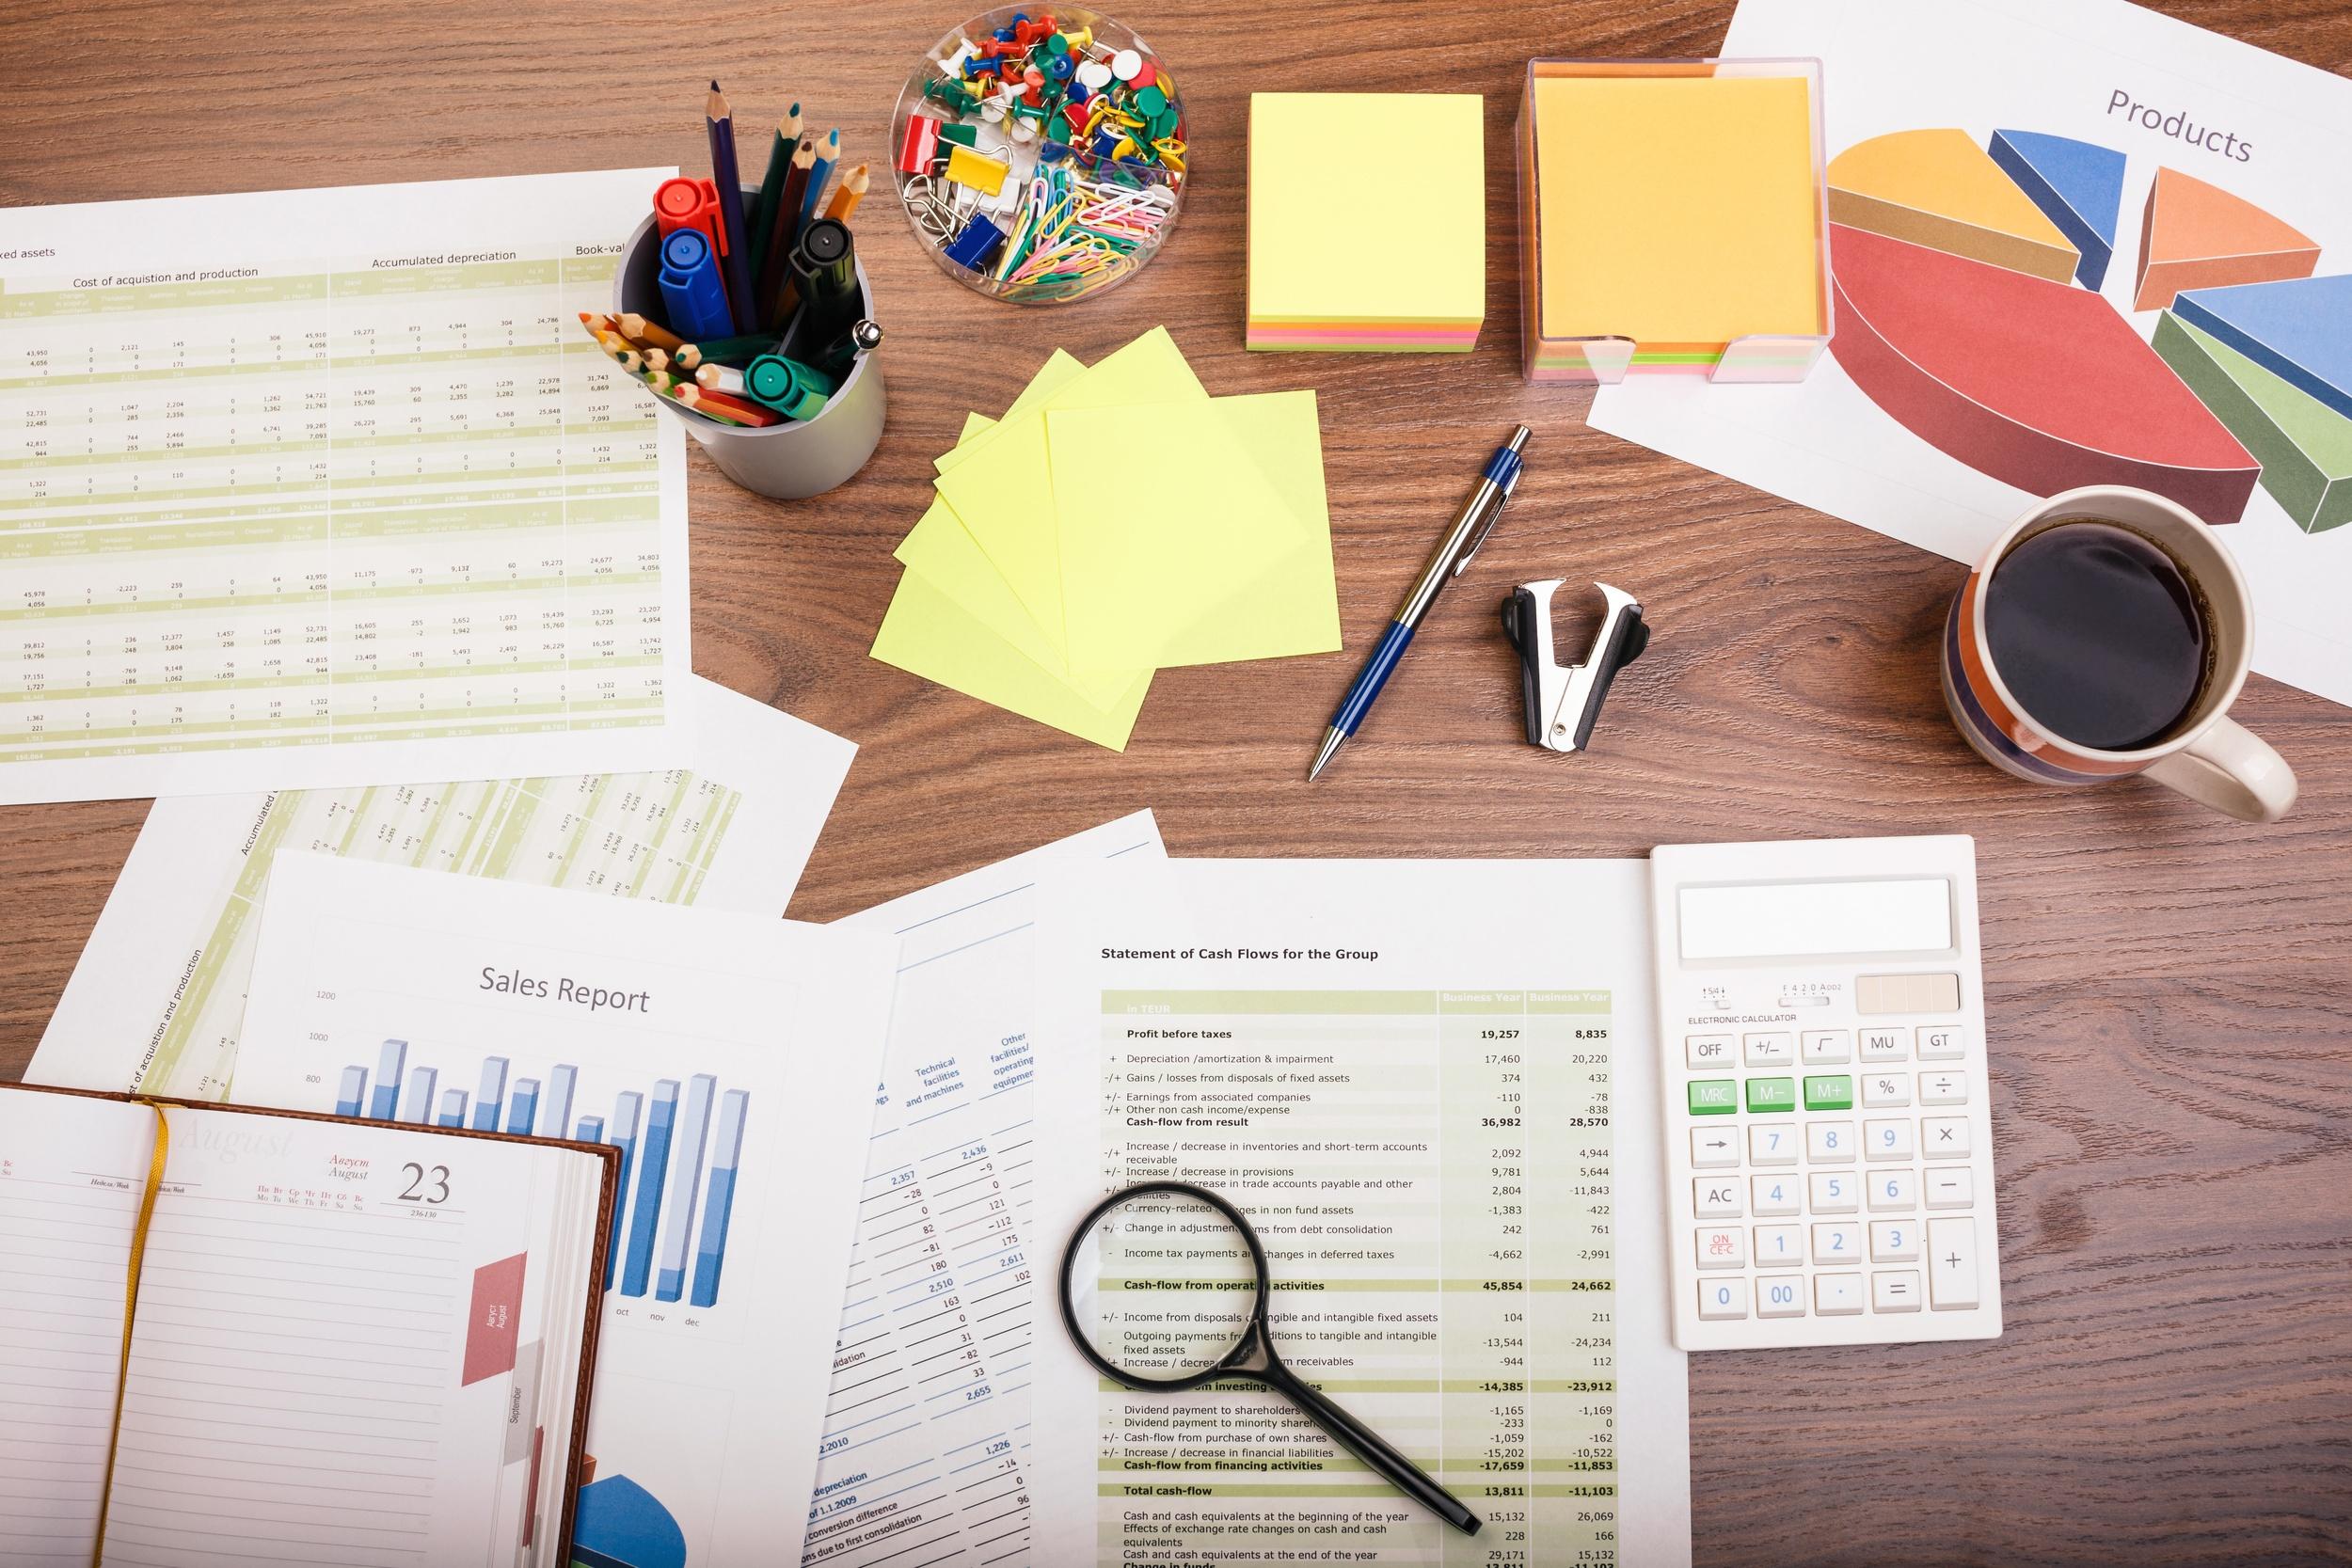 Employee survey types